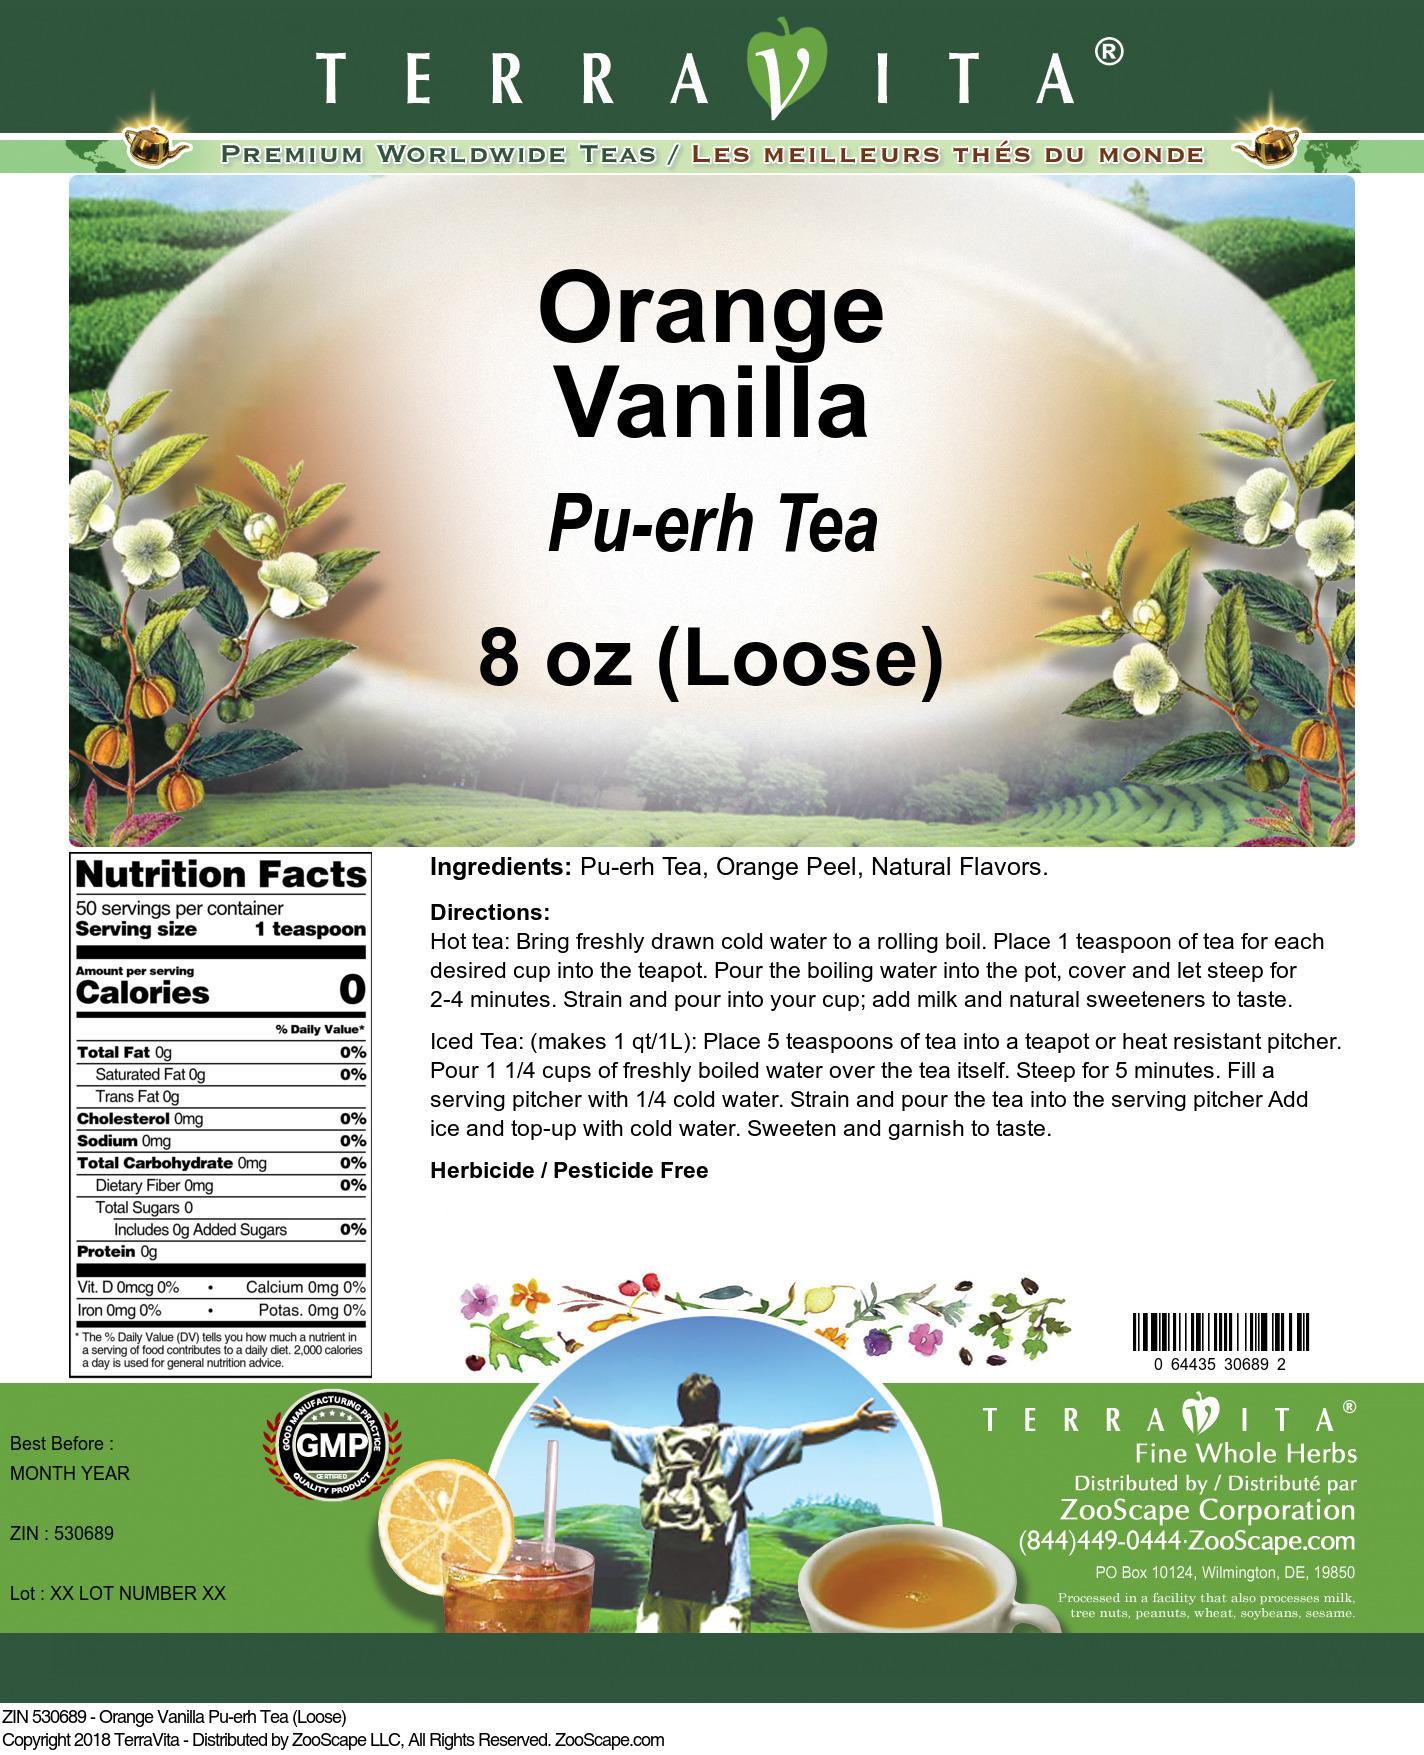 Orange Vanilla Pu-erh Tea (Loose)